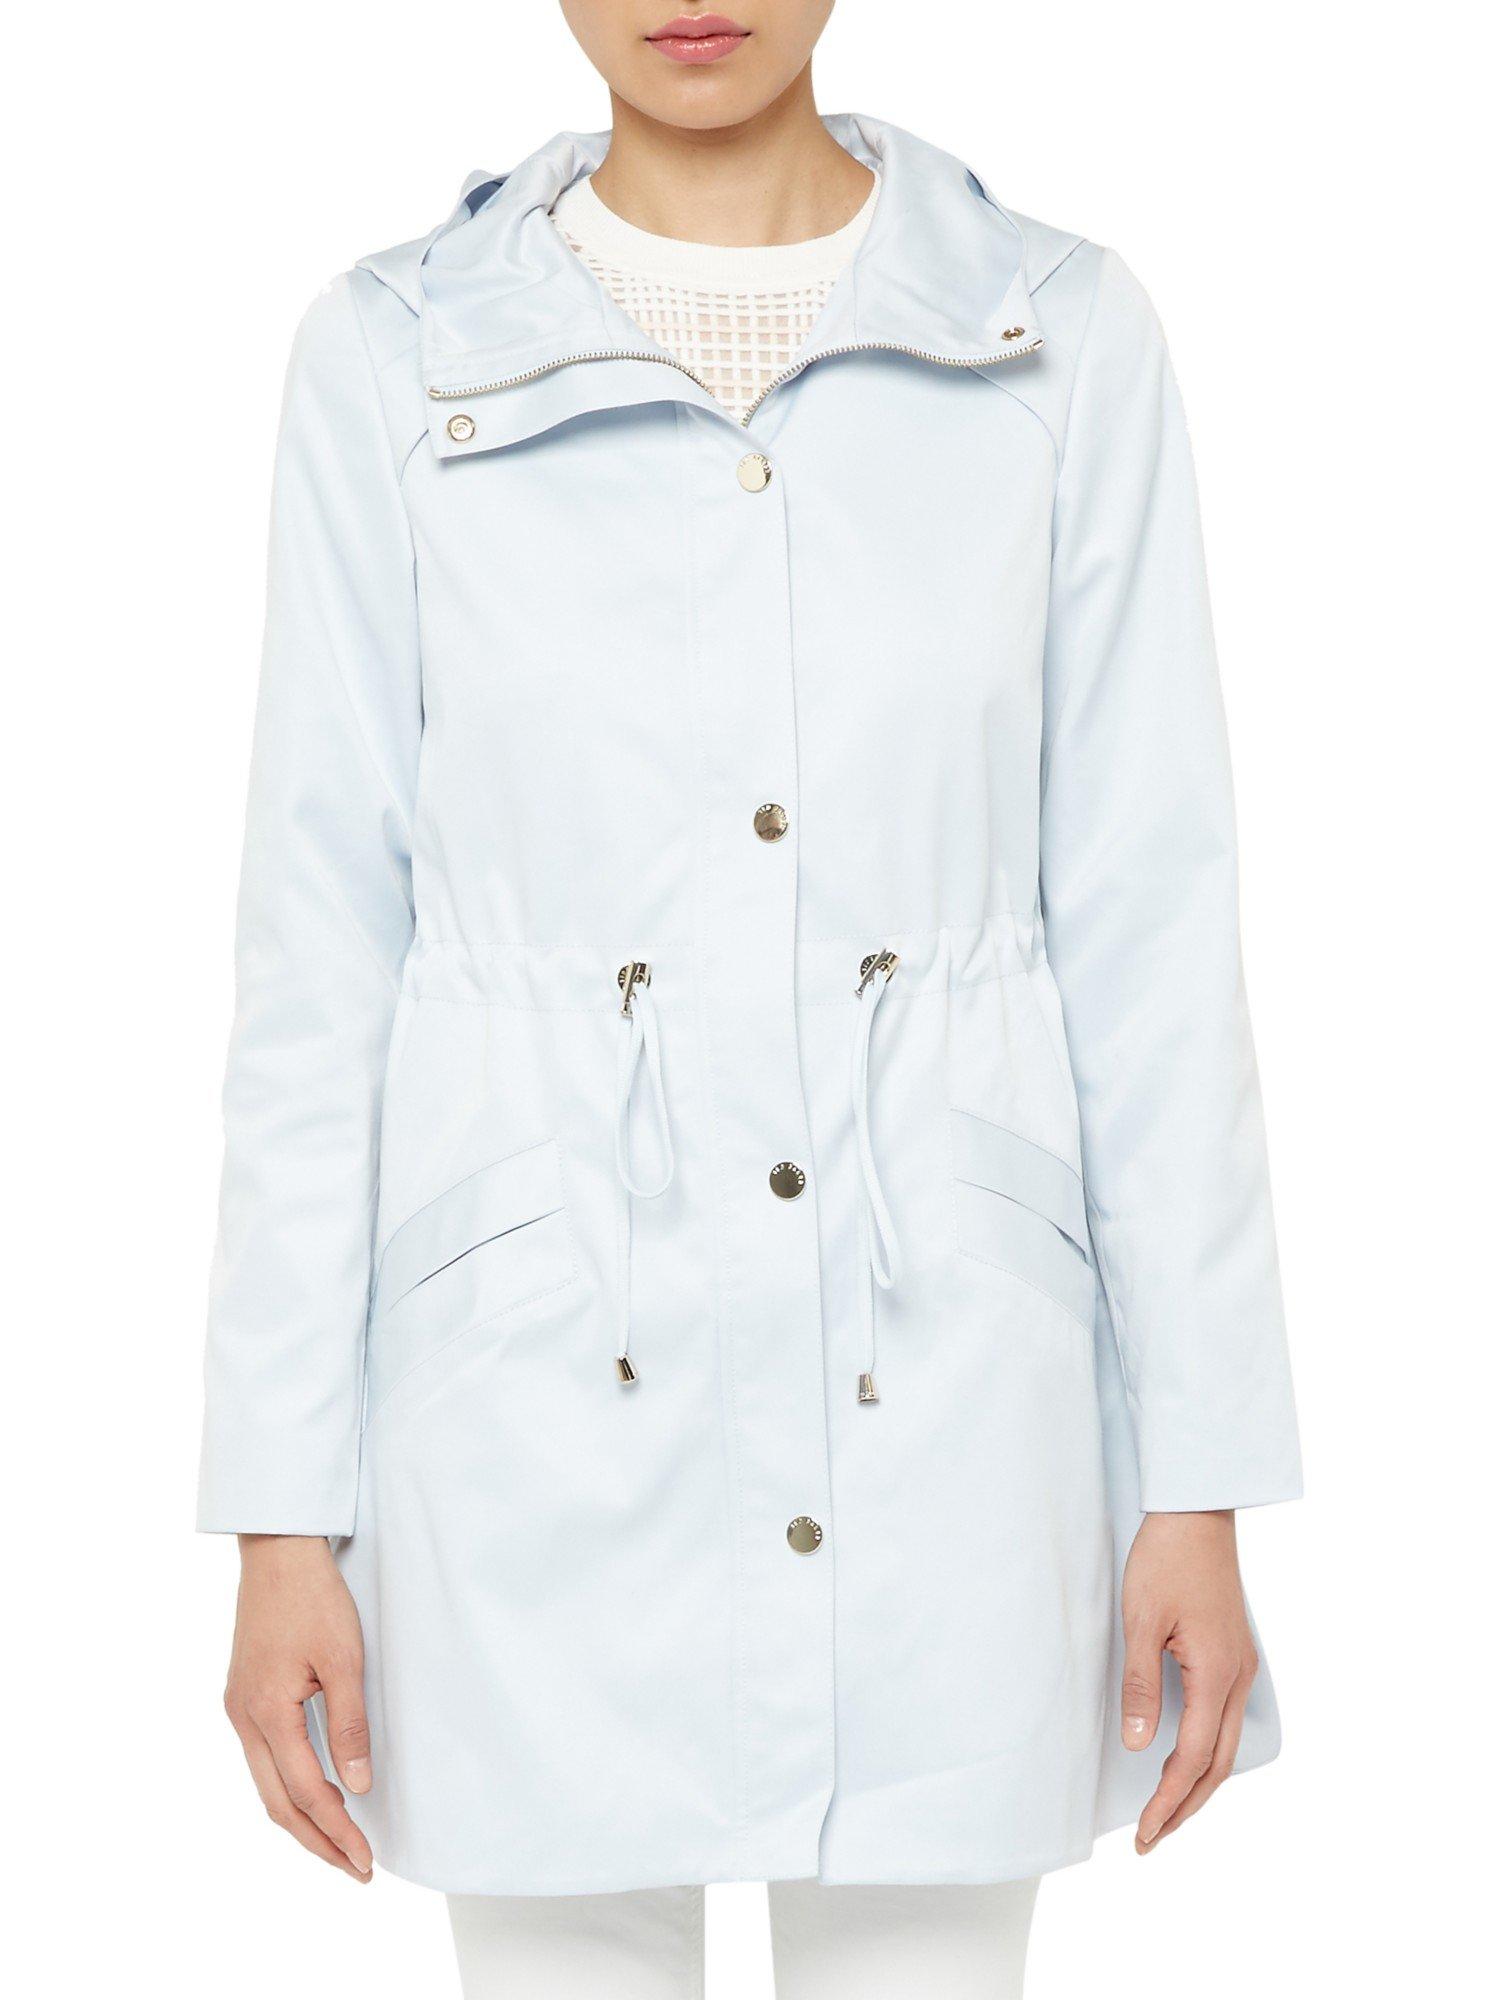 Ted baker Valeska Hooded Parka Jacket in Blue | Lyst